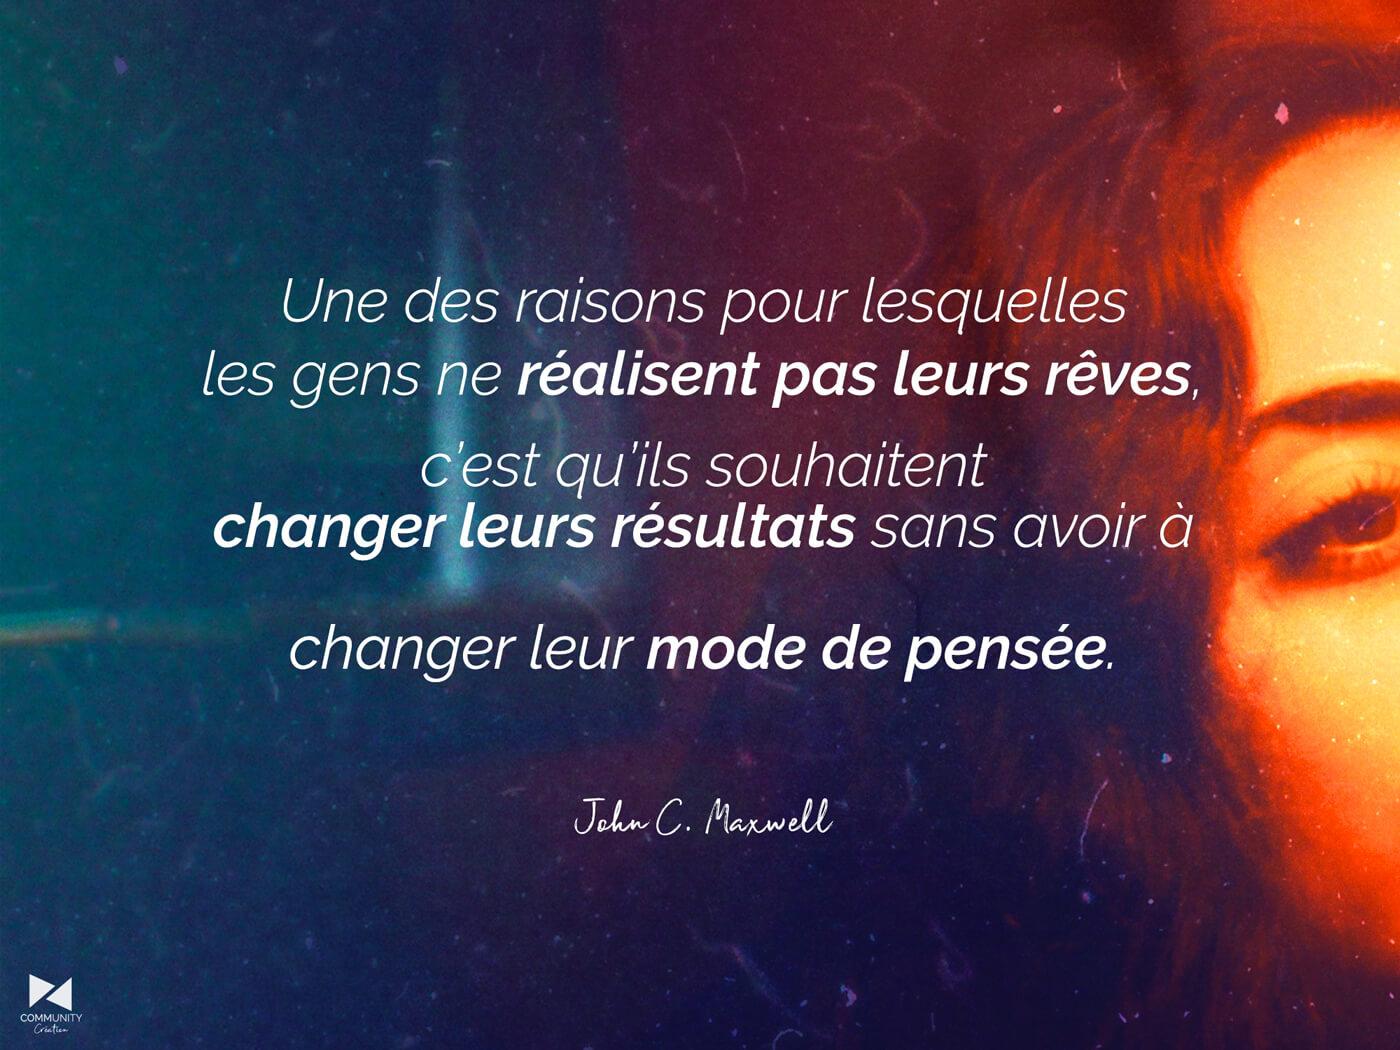 «Changer notre mode de pensée» par John C. Maxwell